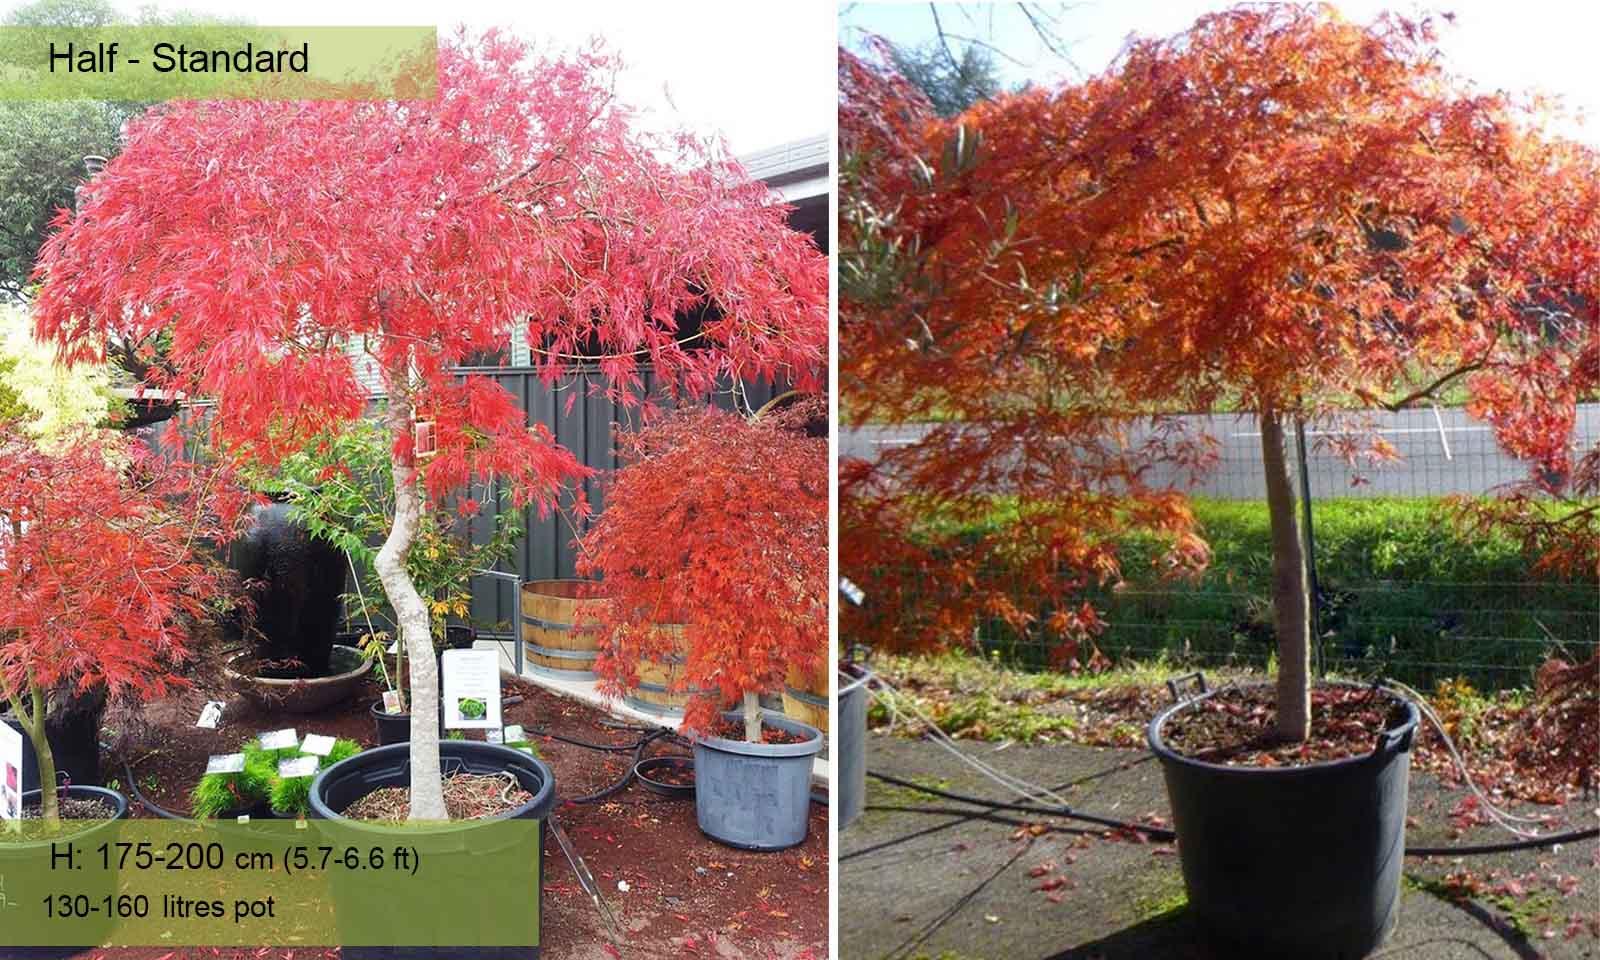 Acer Palmatum Dissectum Viridis (Japanese Maple) - Half Standard